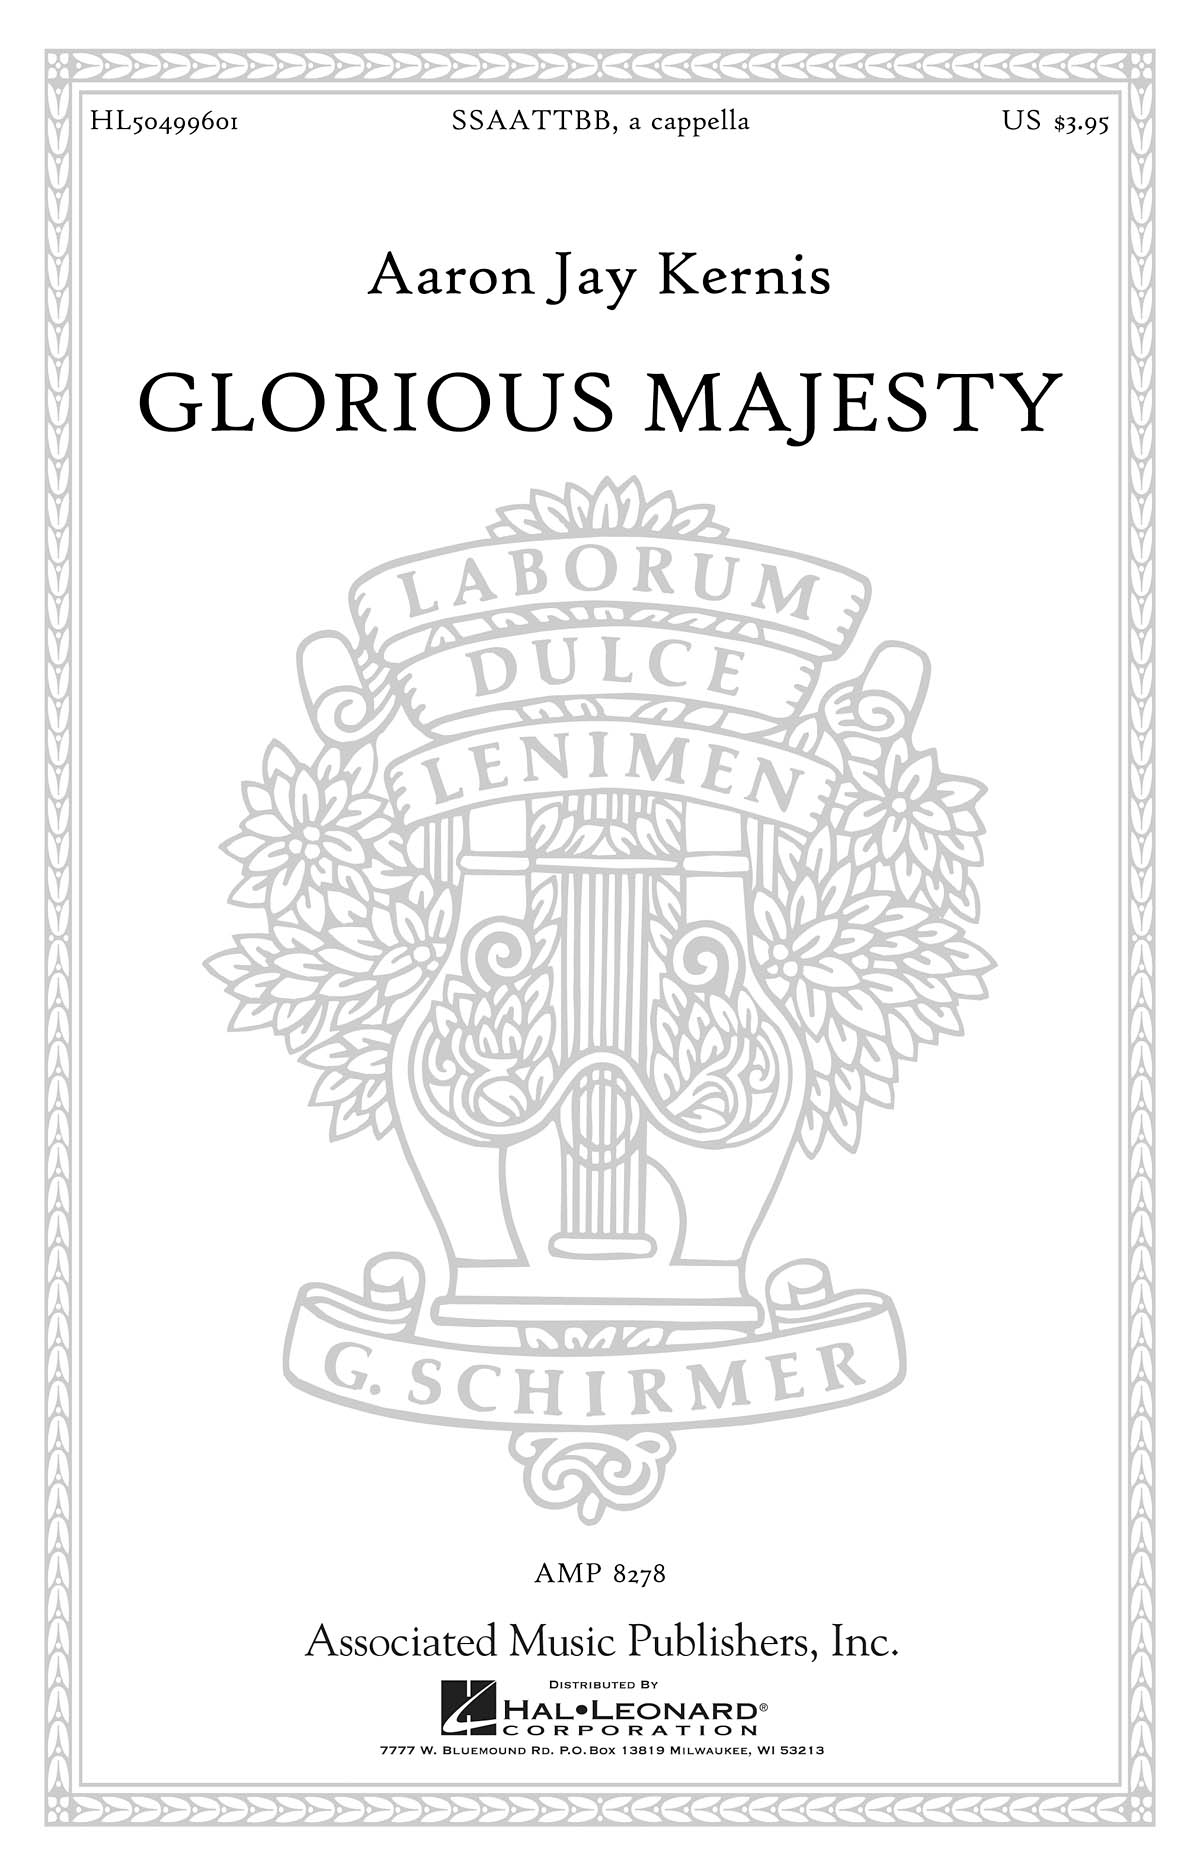 Aaron Jay Kernis: Glorious Majesty: Double Choir: Vocal Score